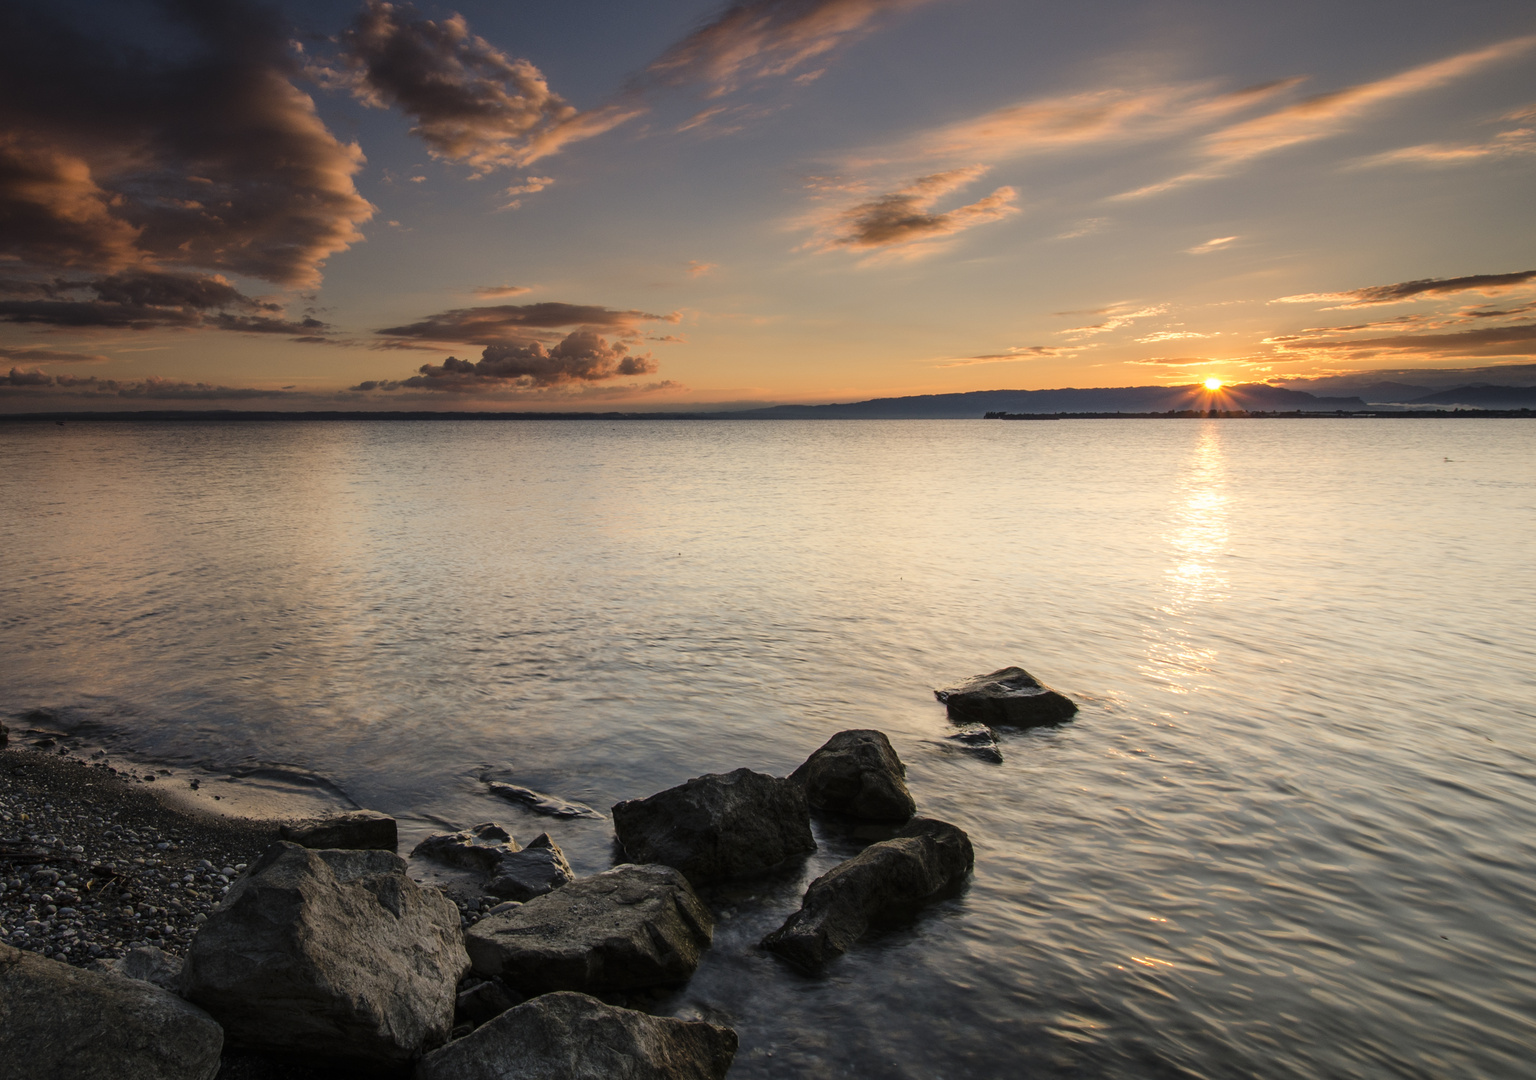 Sonnenaufgang am Bodensee